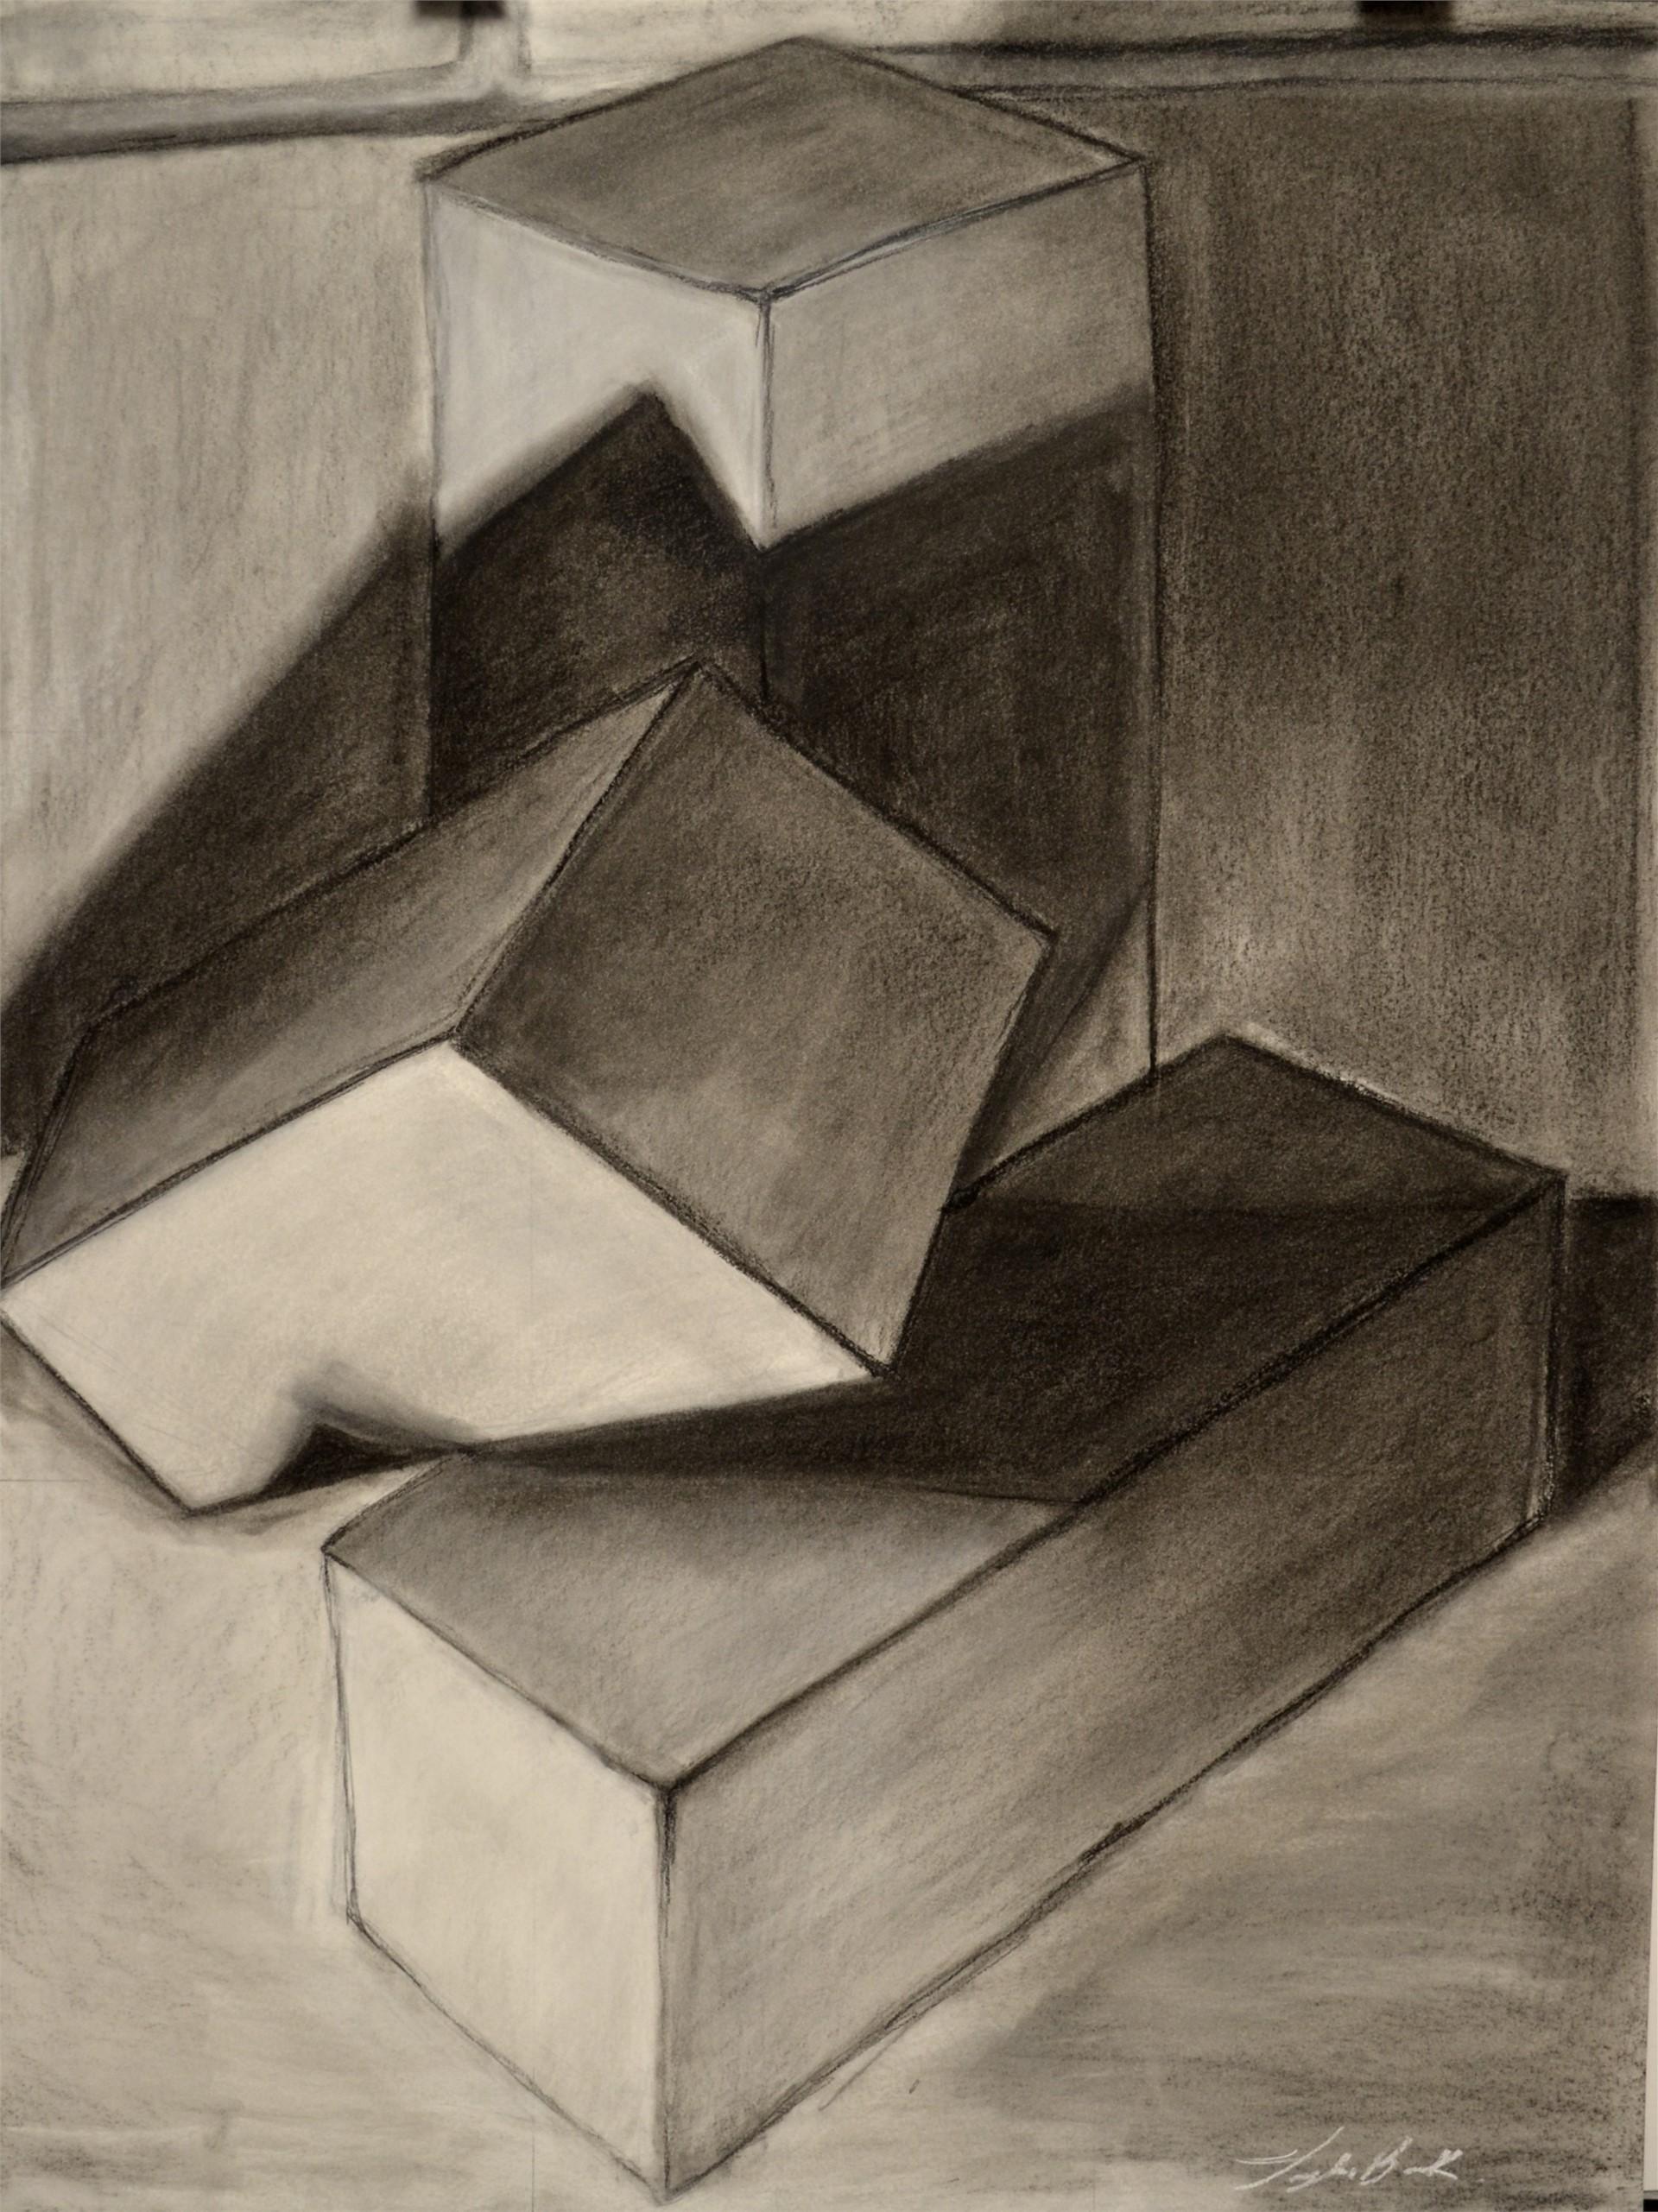 Taylor Bock, Rectilinear Prism Still-Life, charcoal, 24 x 18, 2015